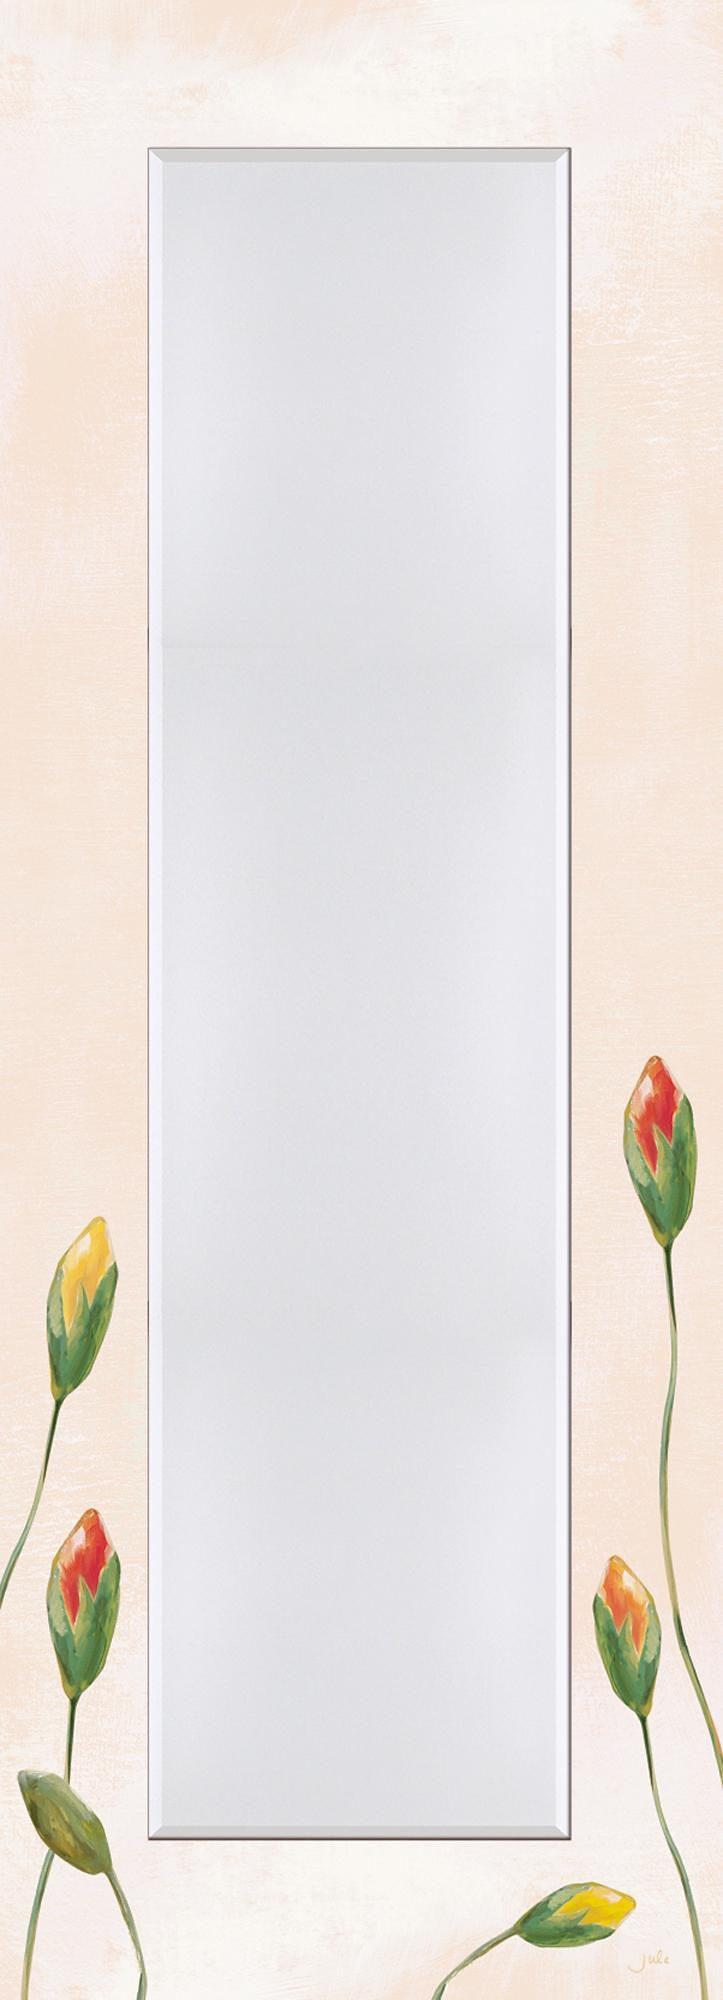 Home affaire, Spiegel, »Jule: Bunte Mohnblumen«, 50,4/140,4 cm